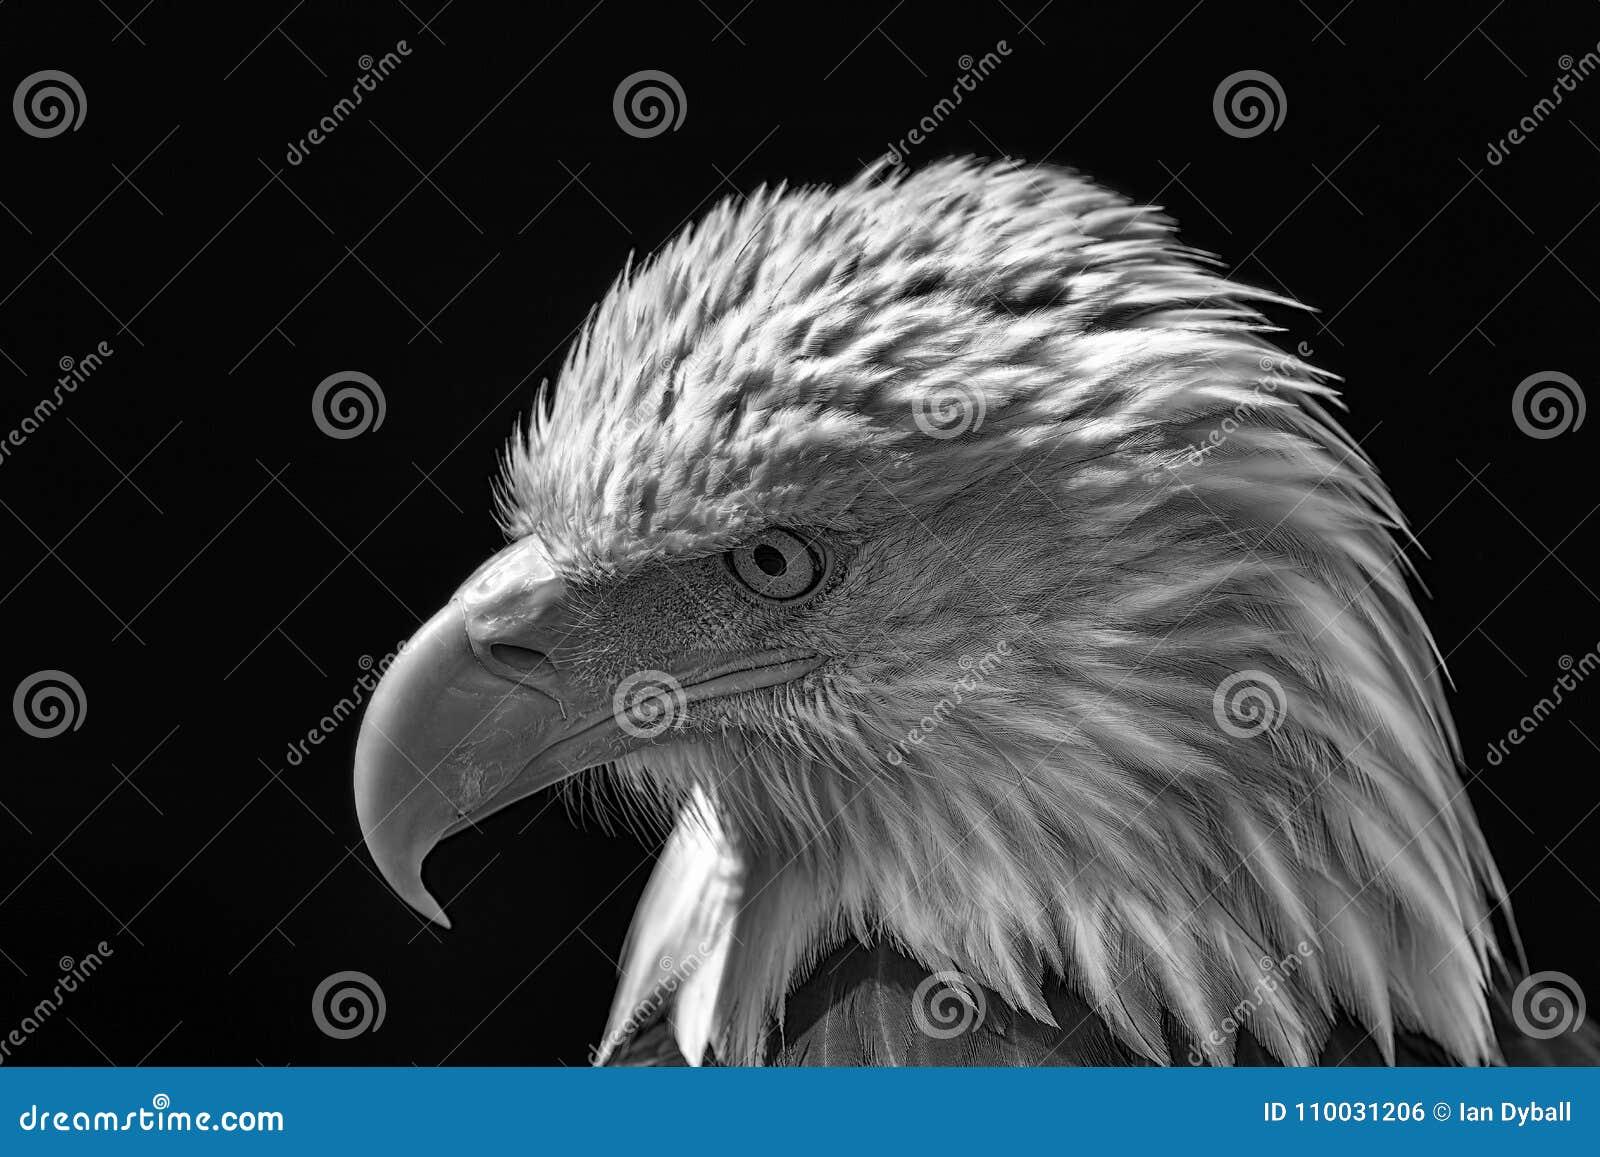 American bald eagle. Powerful high-contrast USA national bird mo